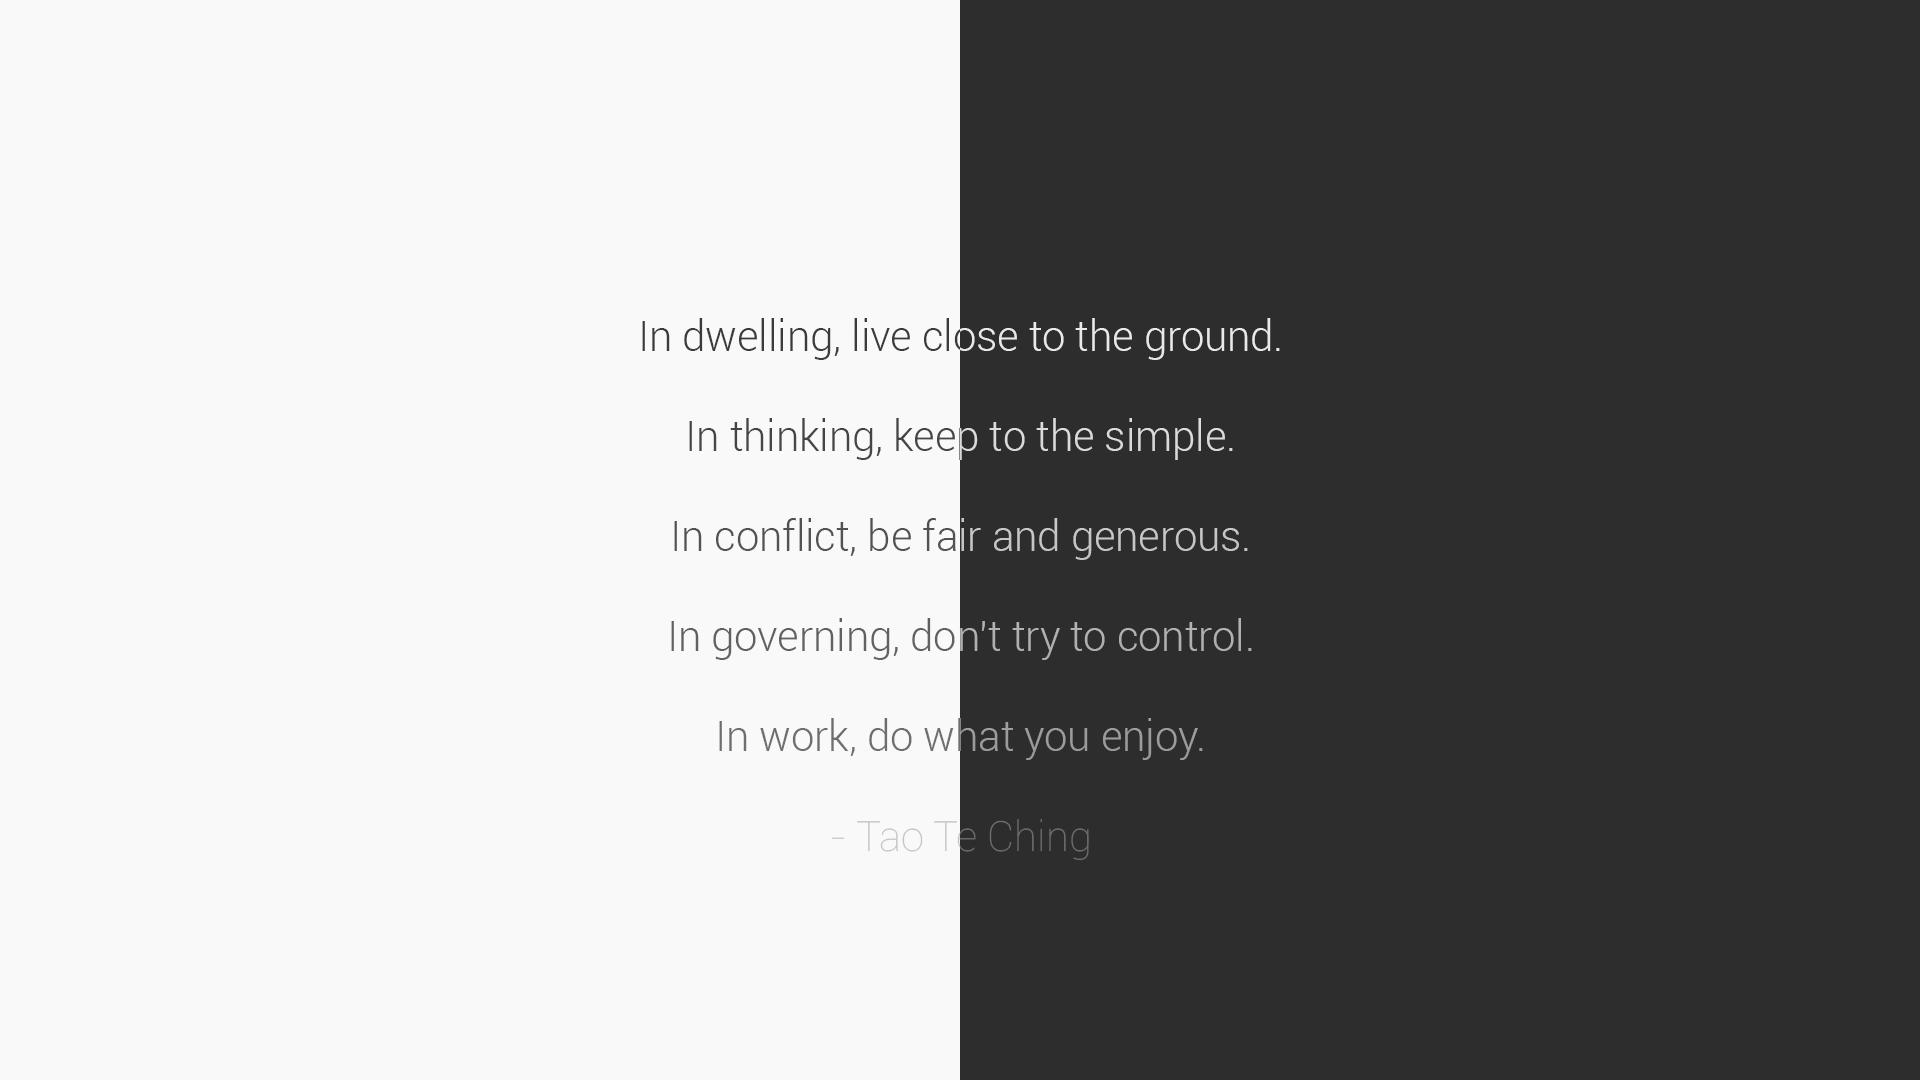 ying yang quotes quotesgram